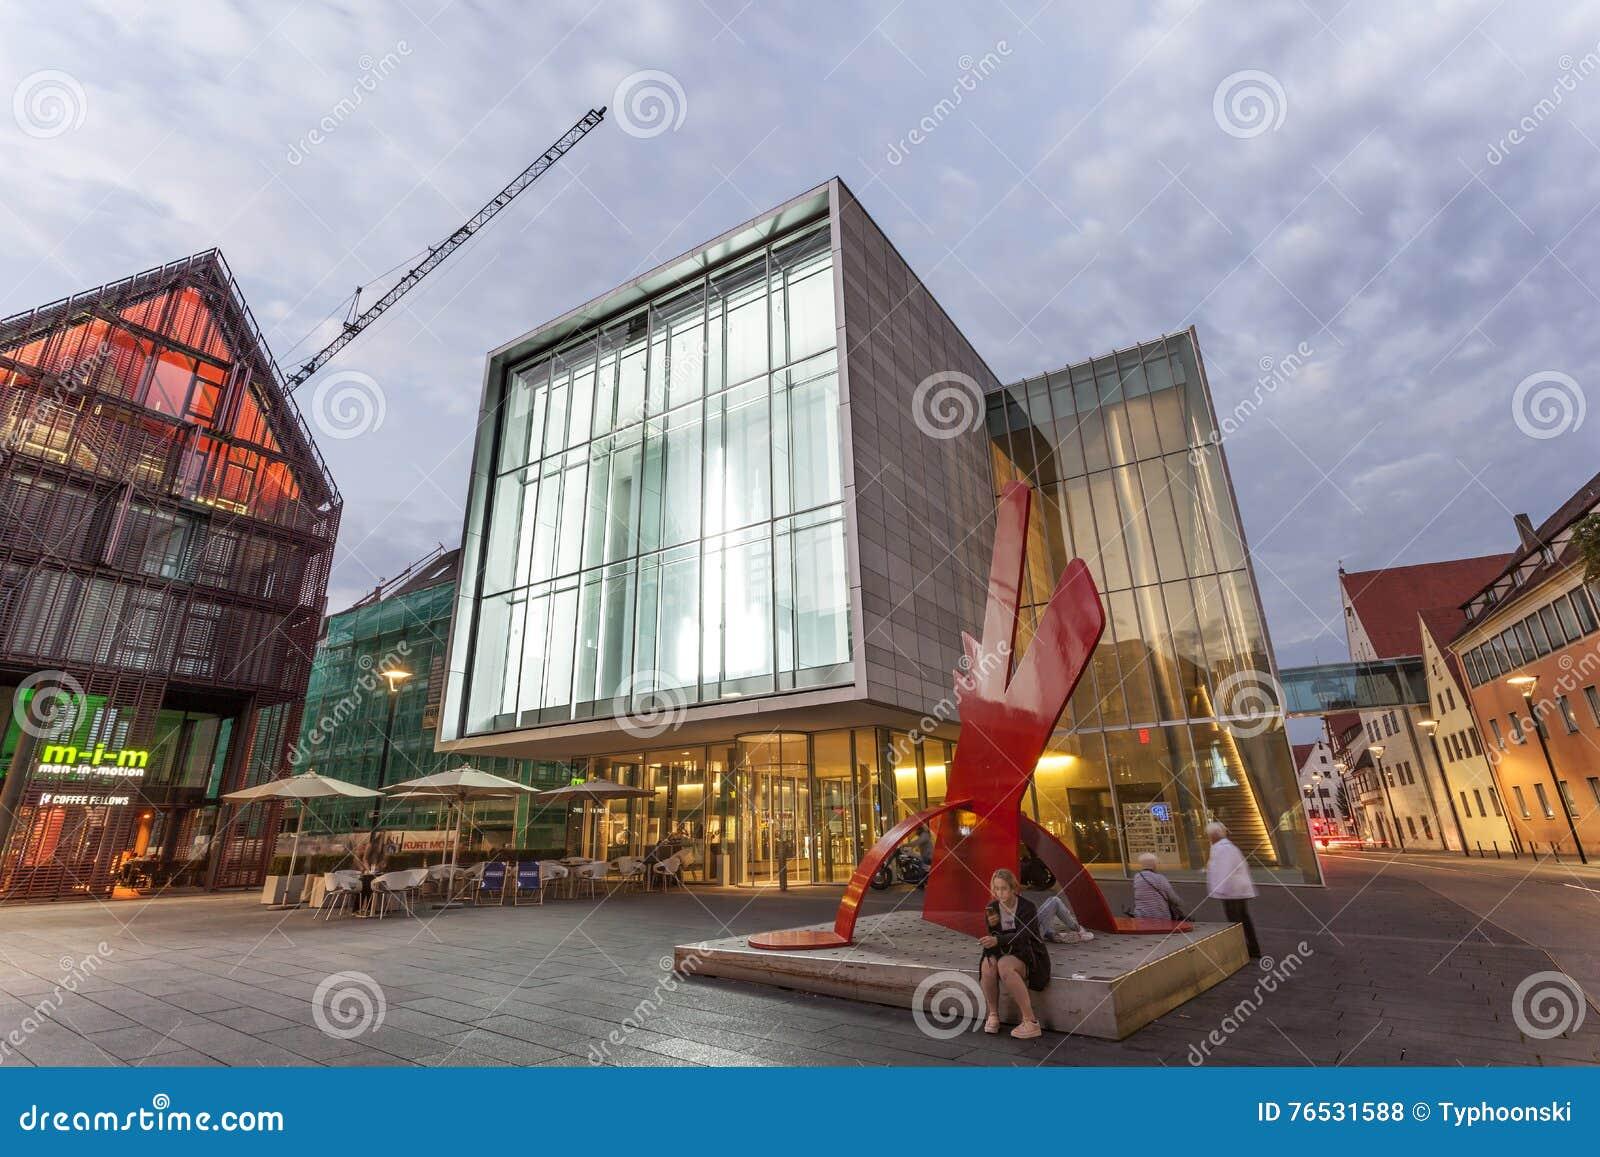 Modern Art Museum In Ulm, Germanyq Editorial Stock Photo - Image of